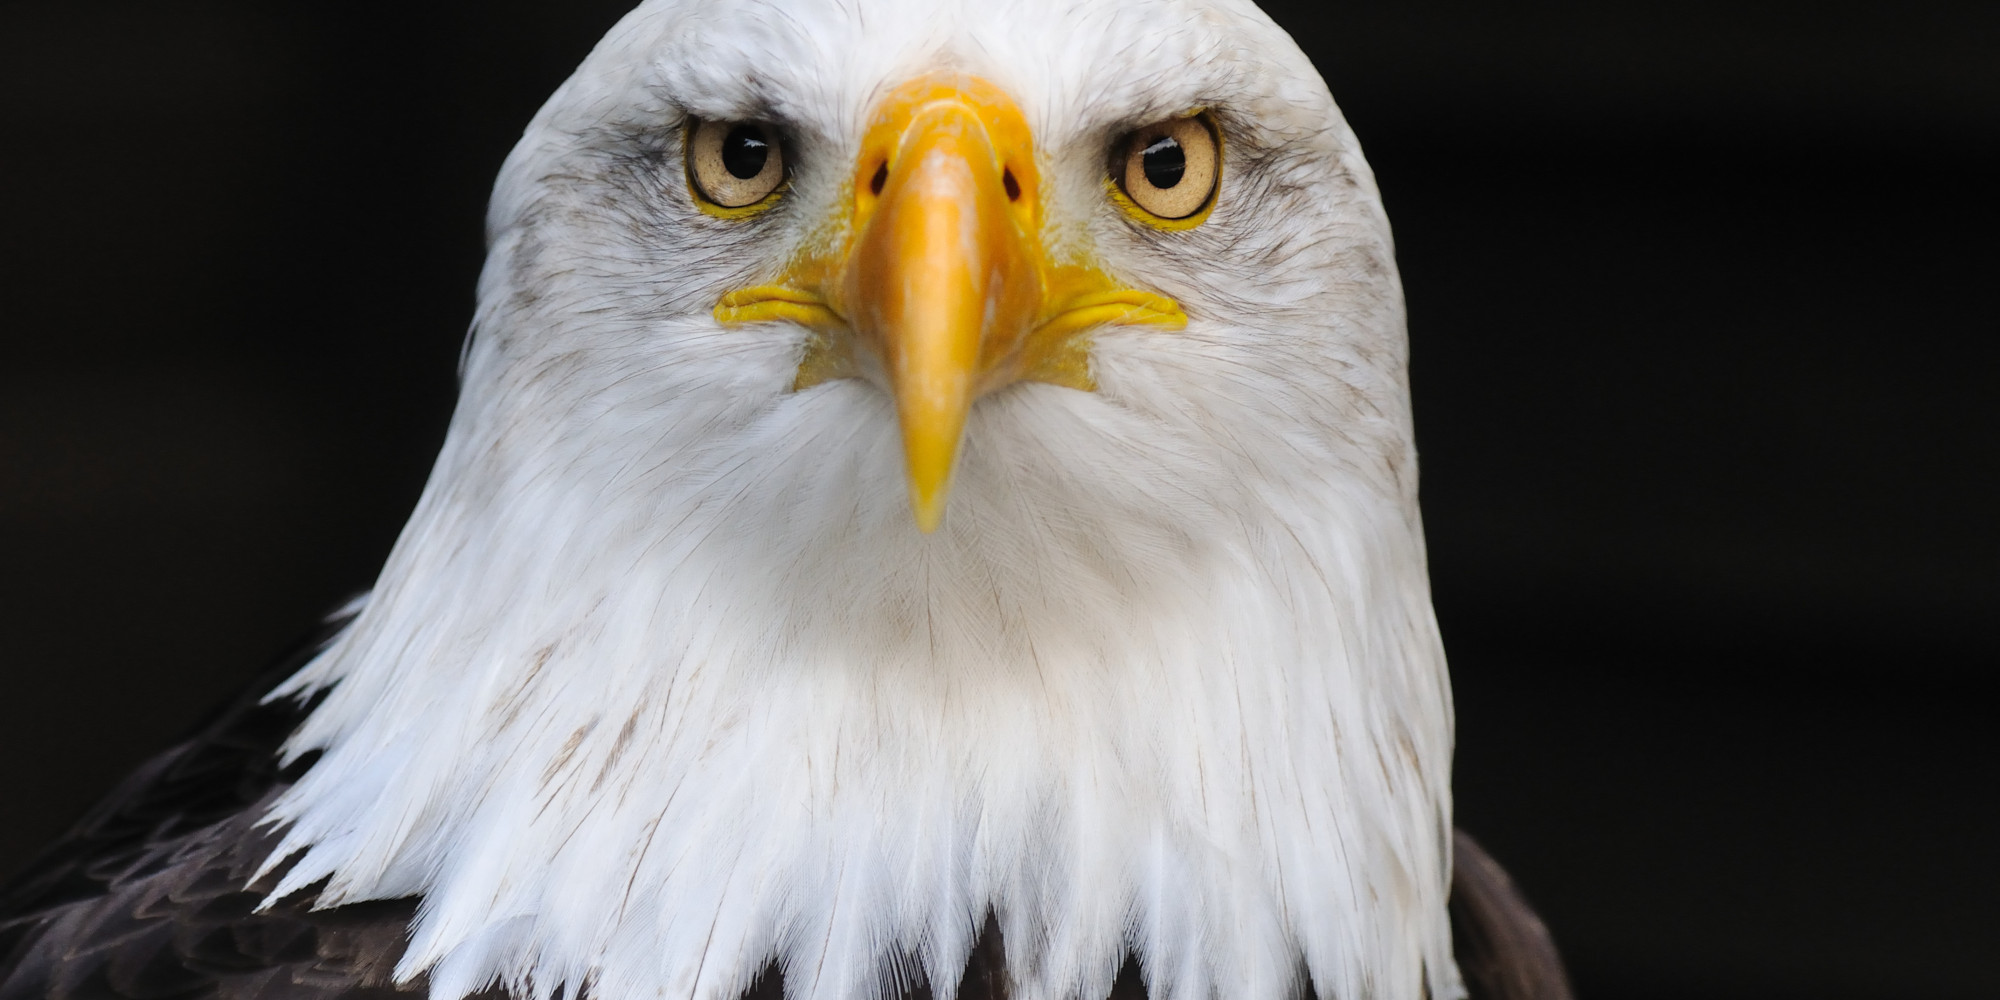 Bald eagle head front - photo#8